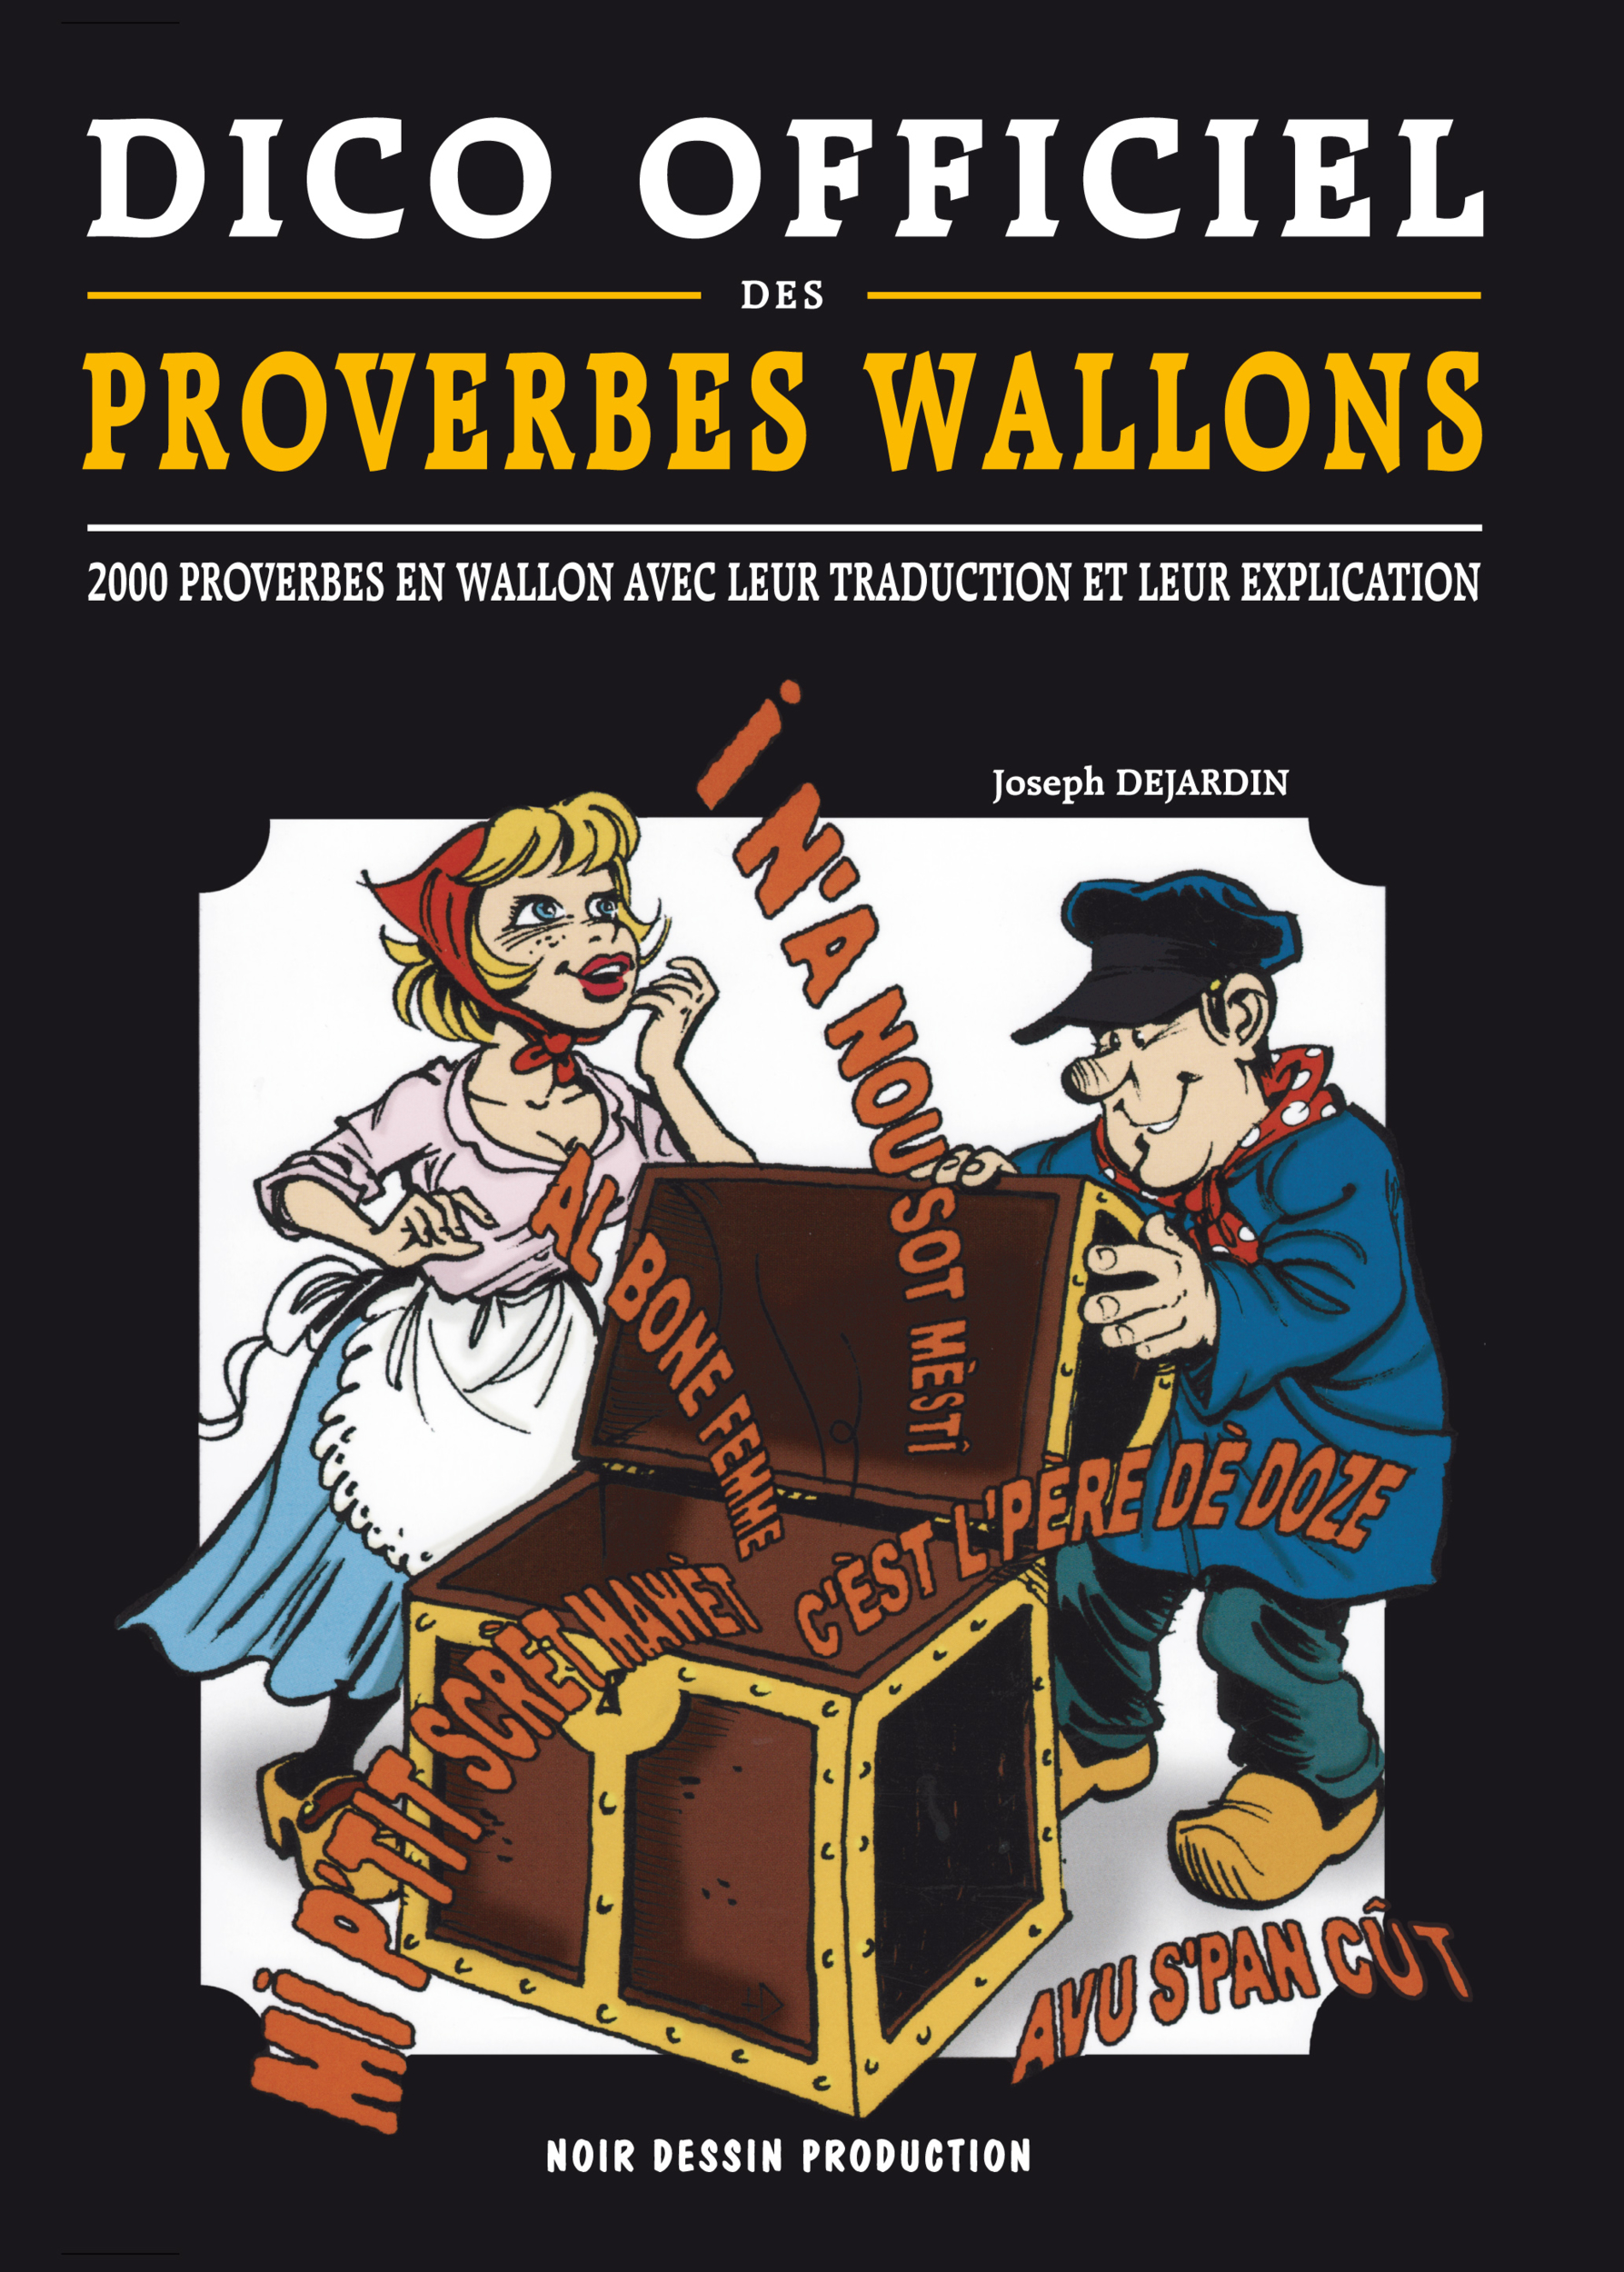 proverbes wallons